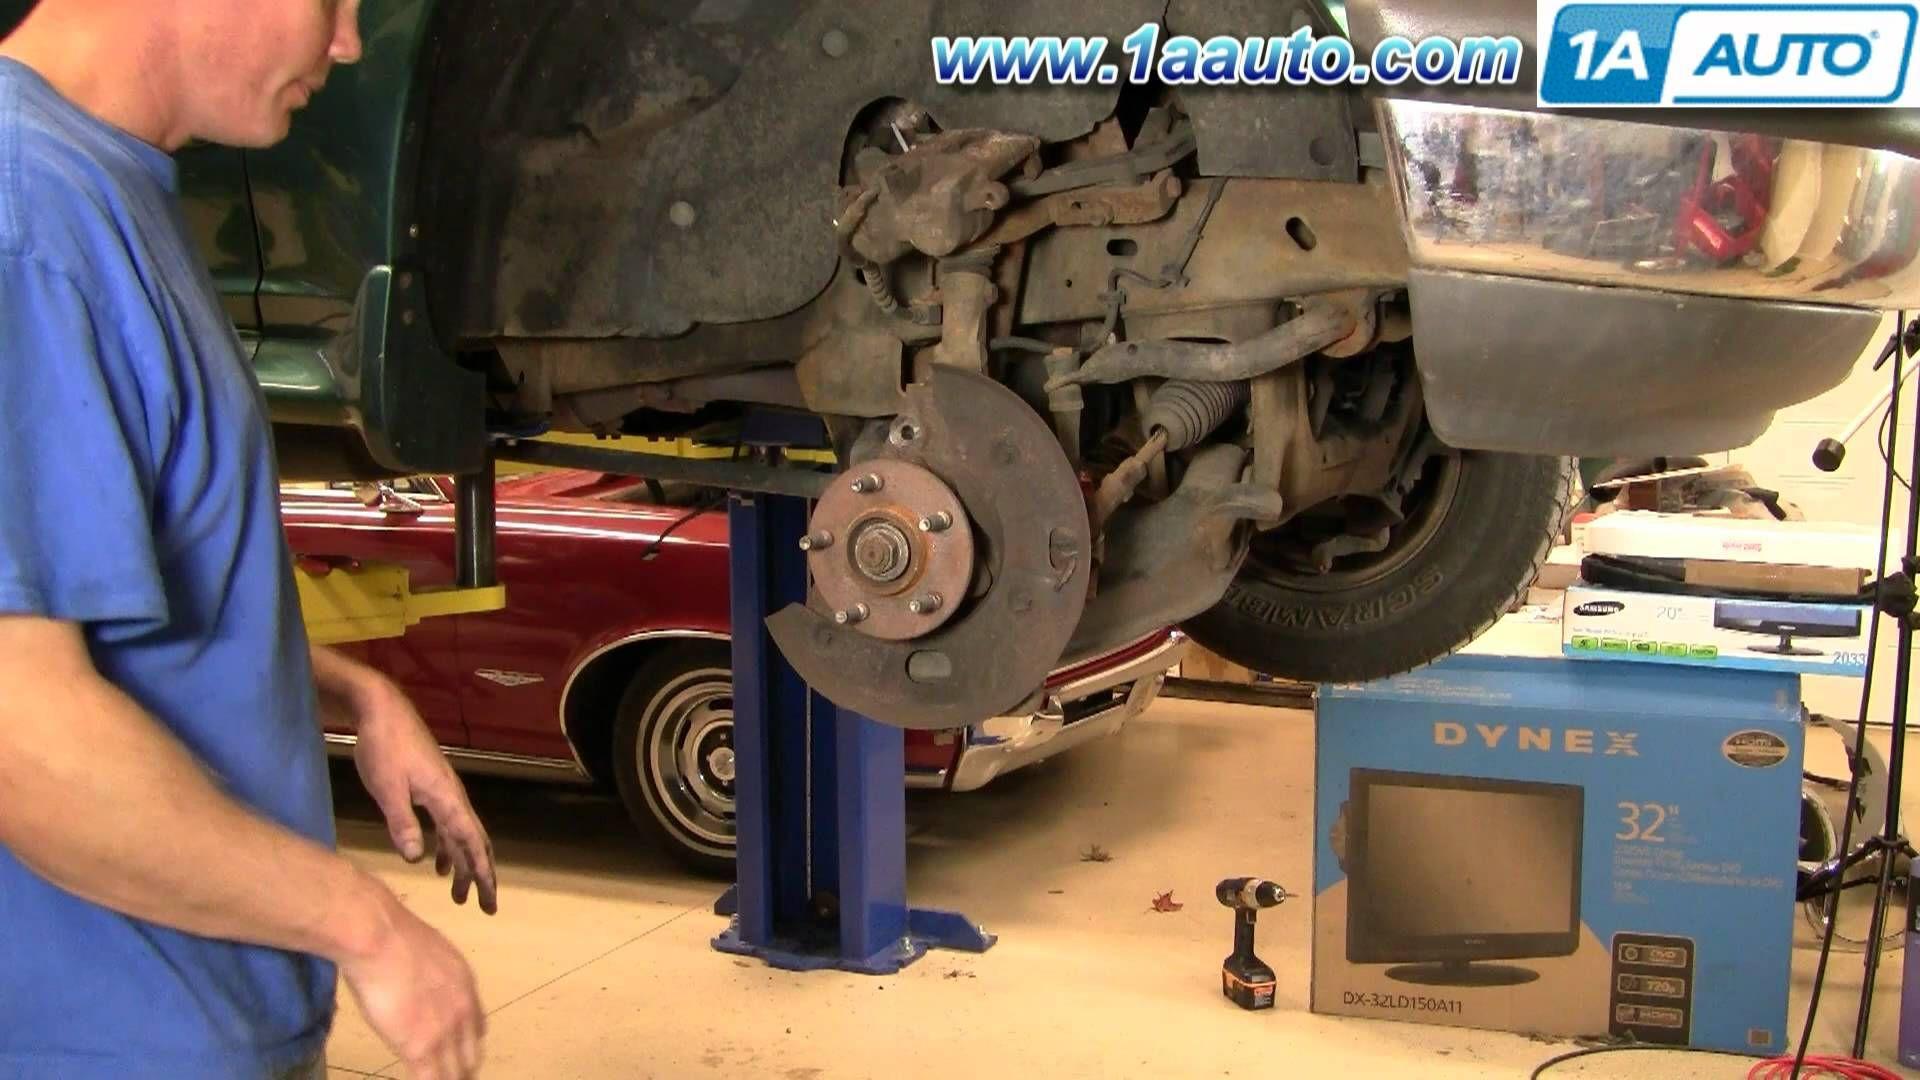 e3d7c14c675c4ec187fd8b0cc3b0bf44 how to install headlight ford explorer mercury mountaineer 95 01